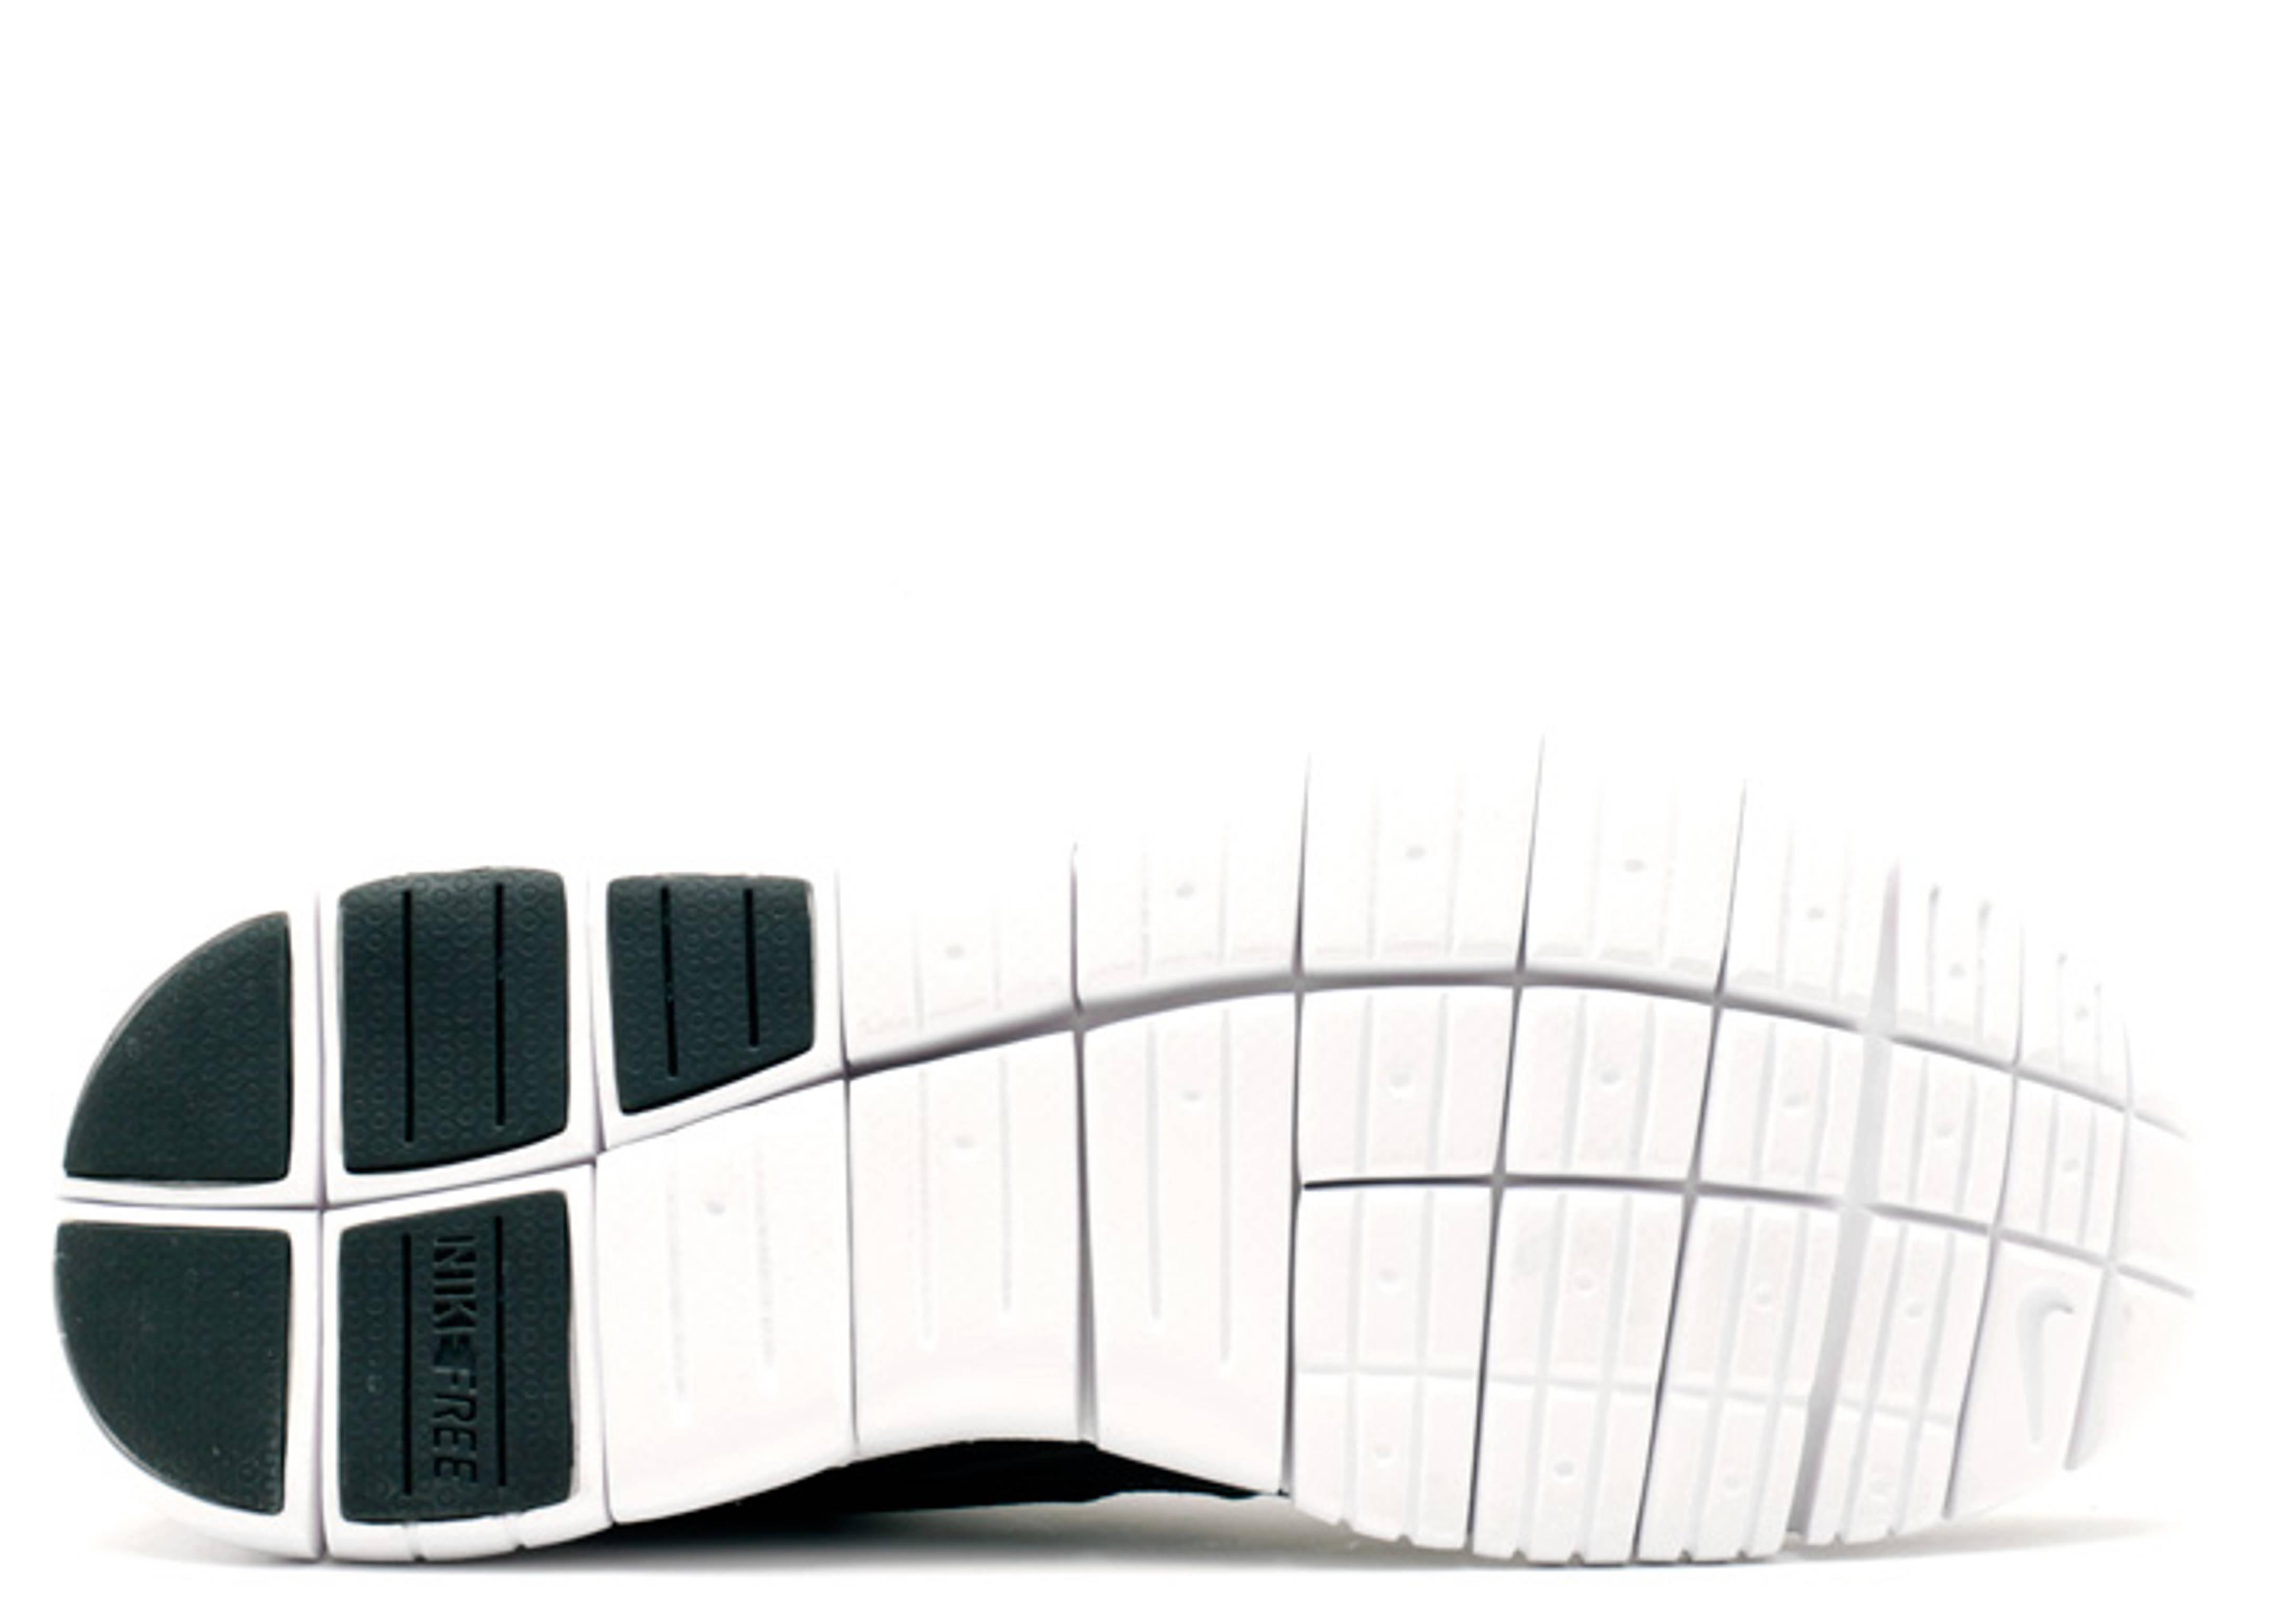 Free Og 14 Apc Sp Nike 705534 091 blackreflect silver